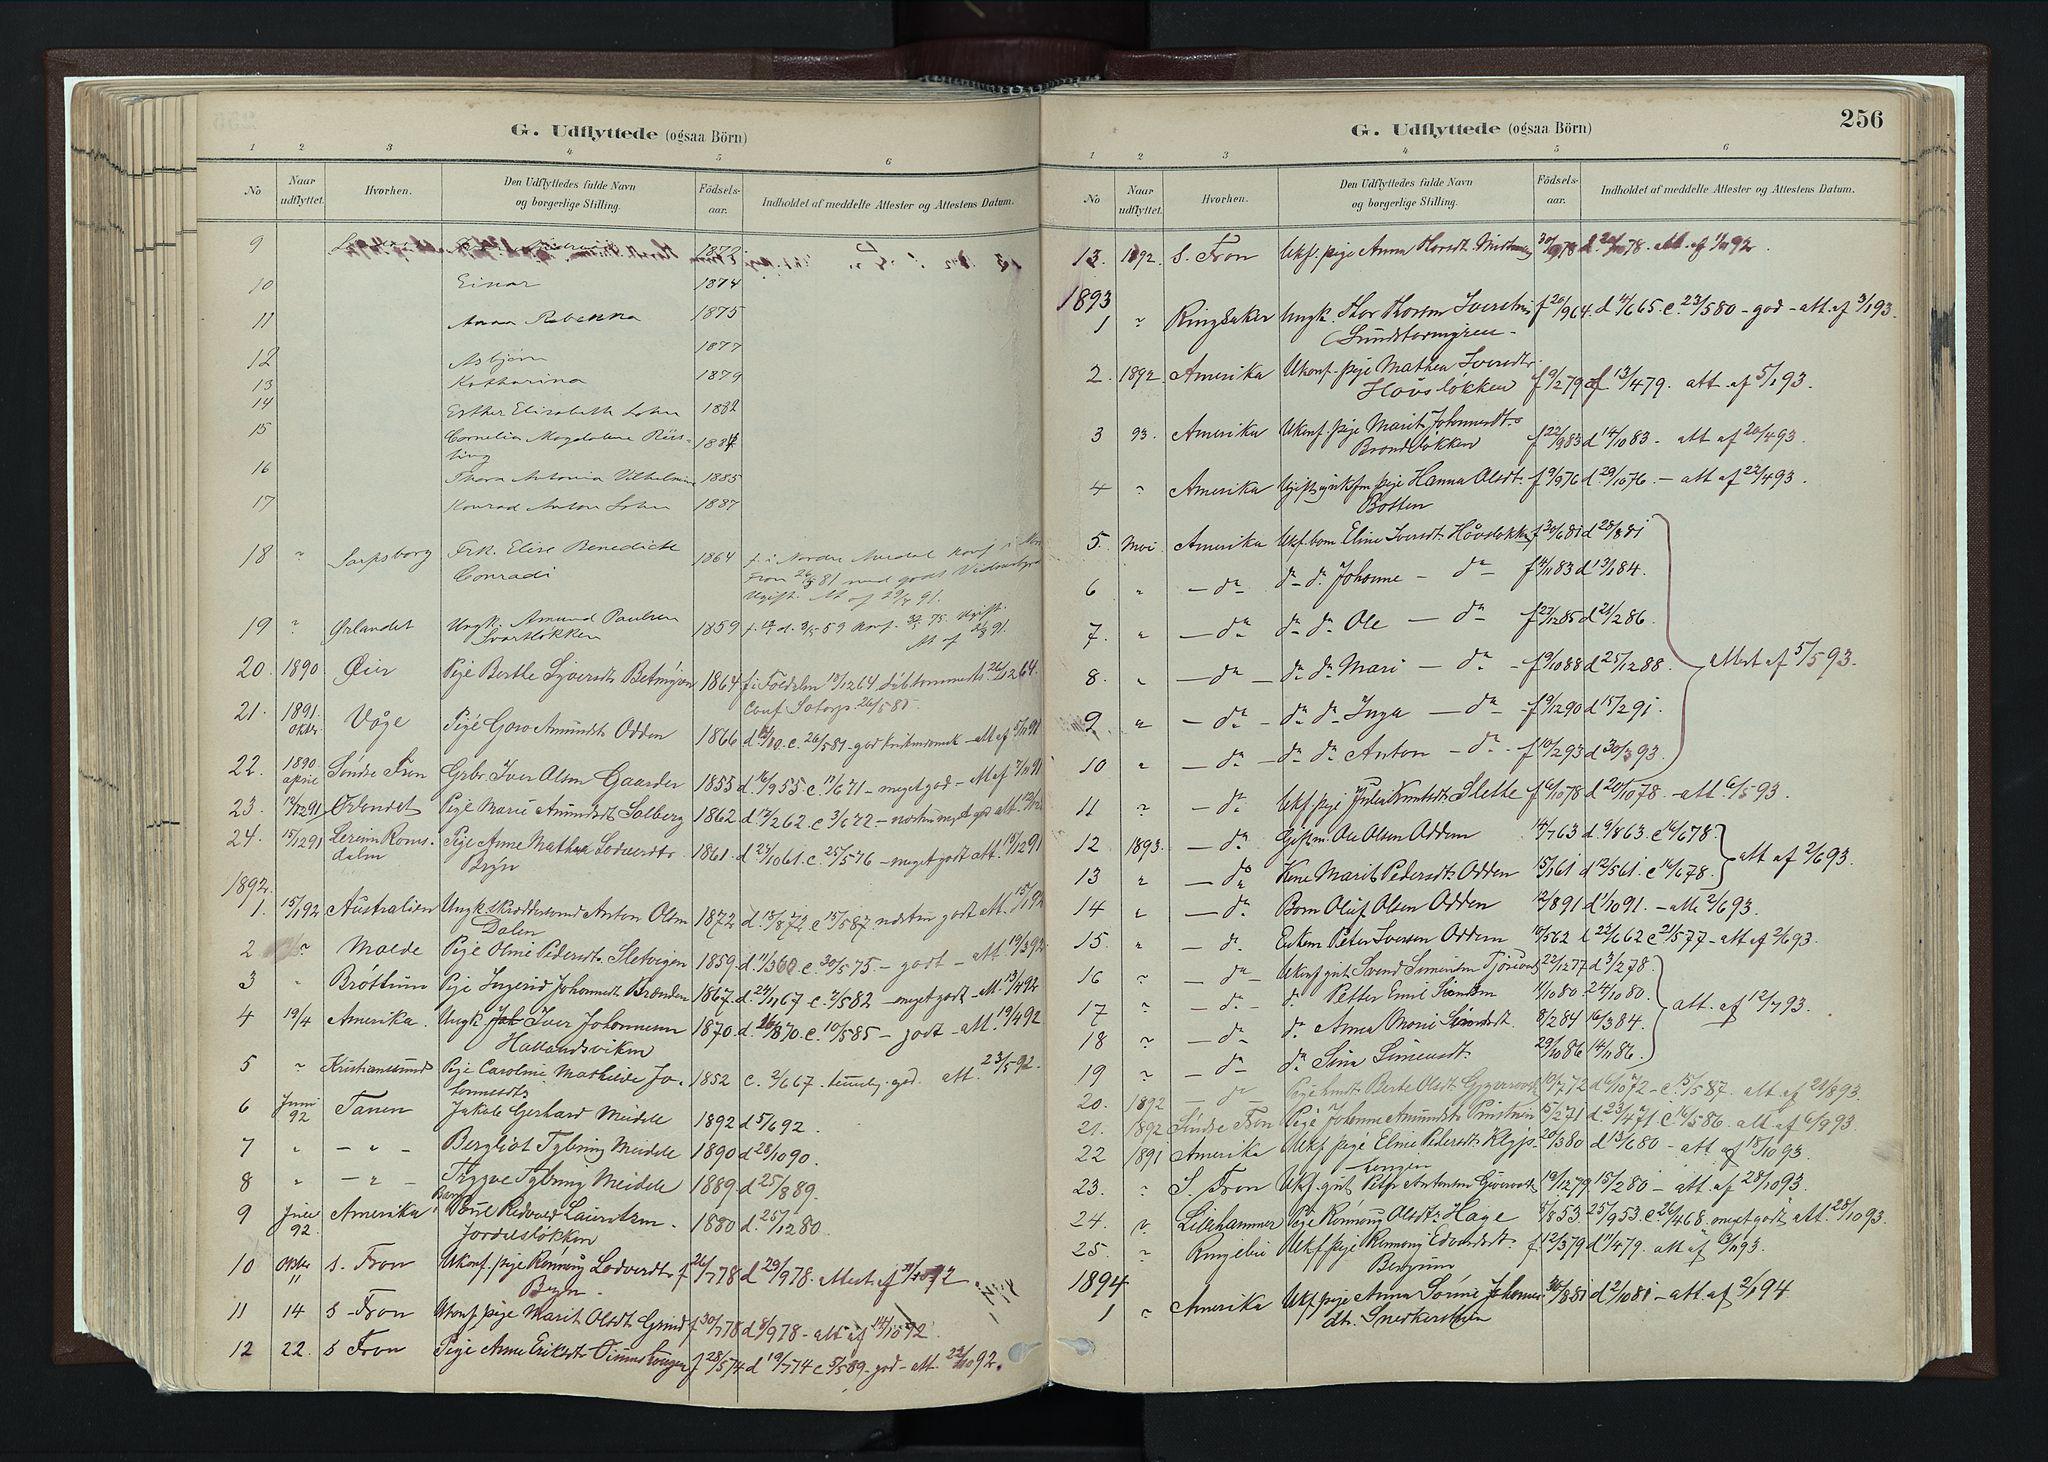 SAH, Nord-Fron prestekontor, Ministerialbok nr. 4, 1884-1914, s. 256